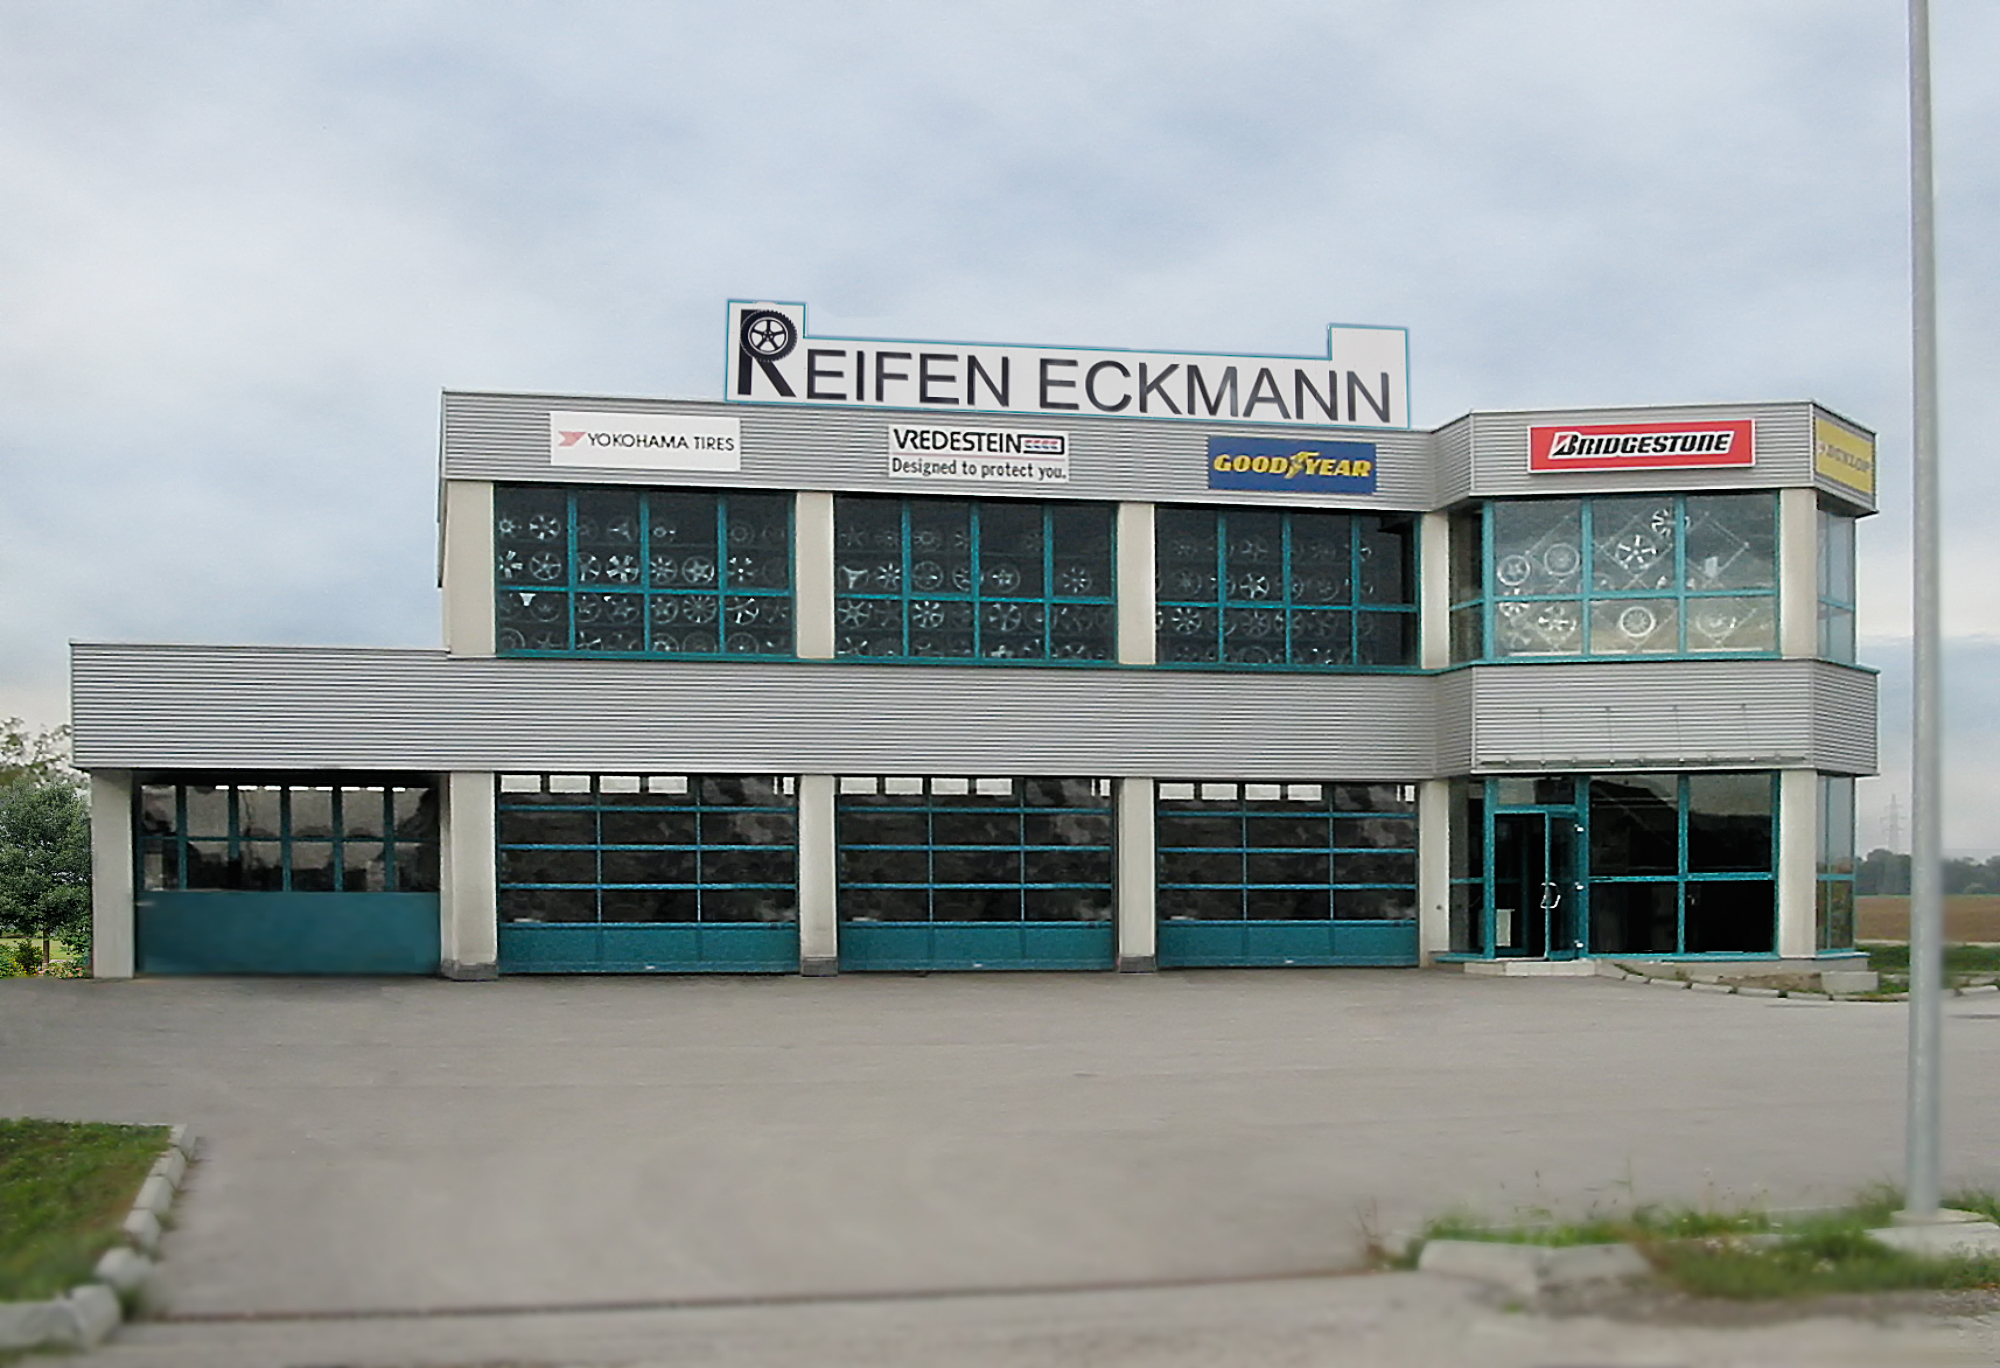 Reifenhandel Eckmann